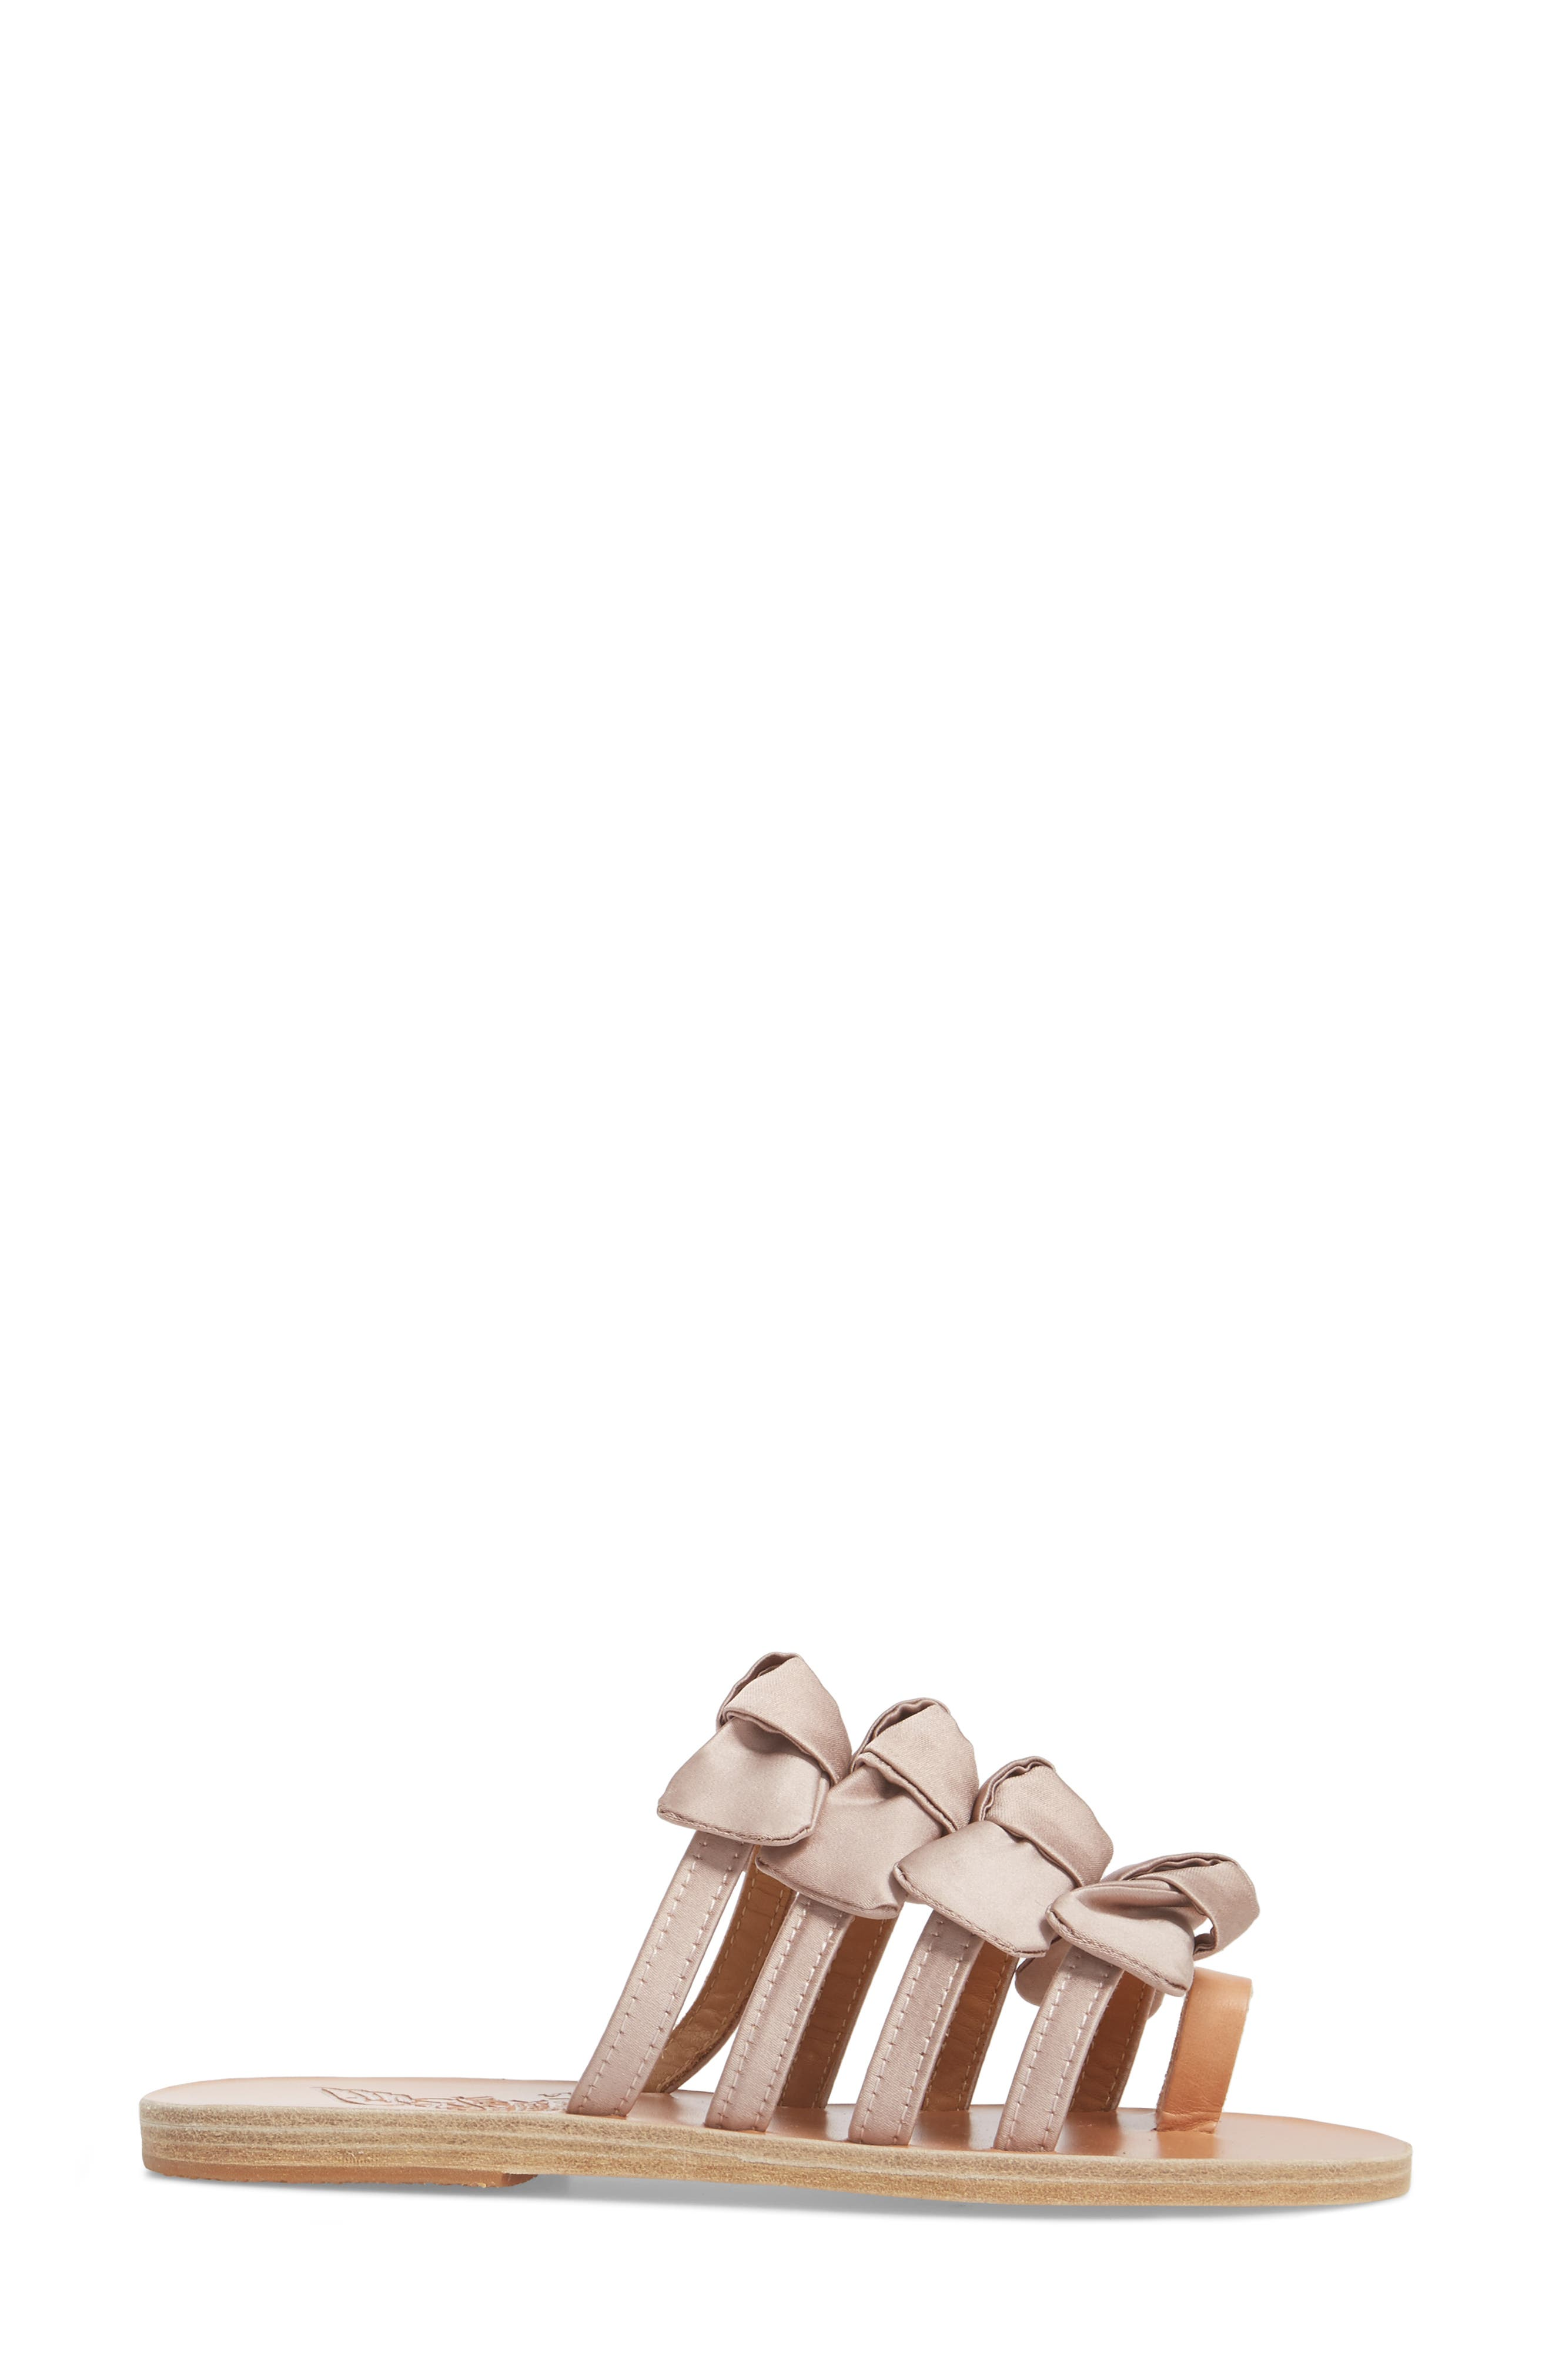 Hara Toe Loop Slide Sandal,                             Alternate thumbnail 3, color,                             650